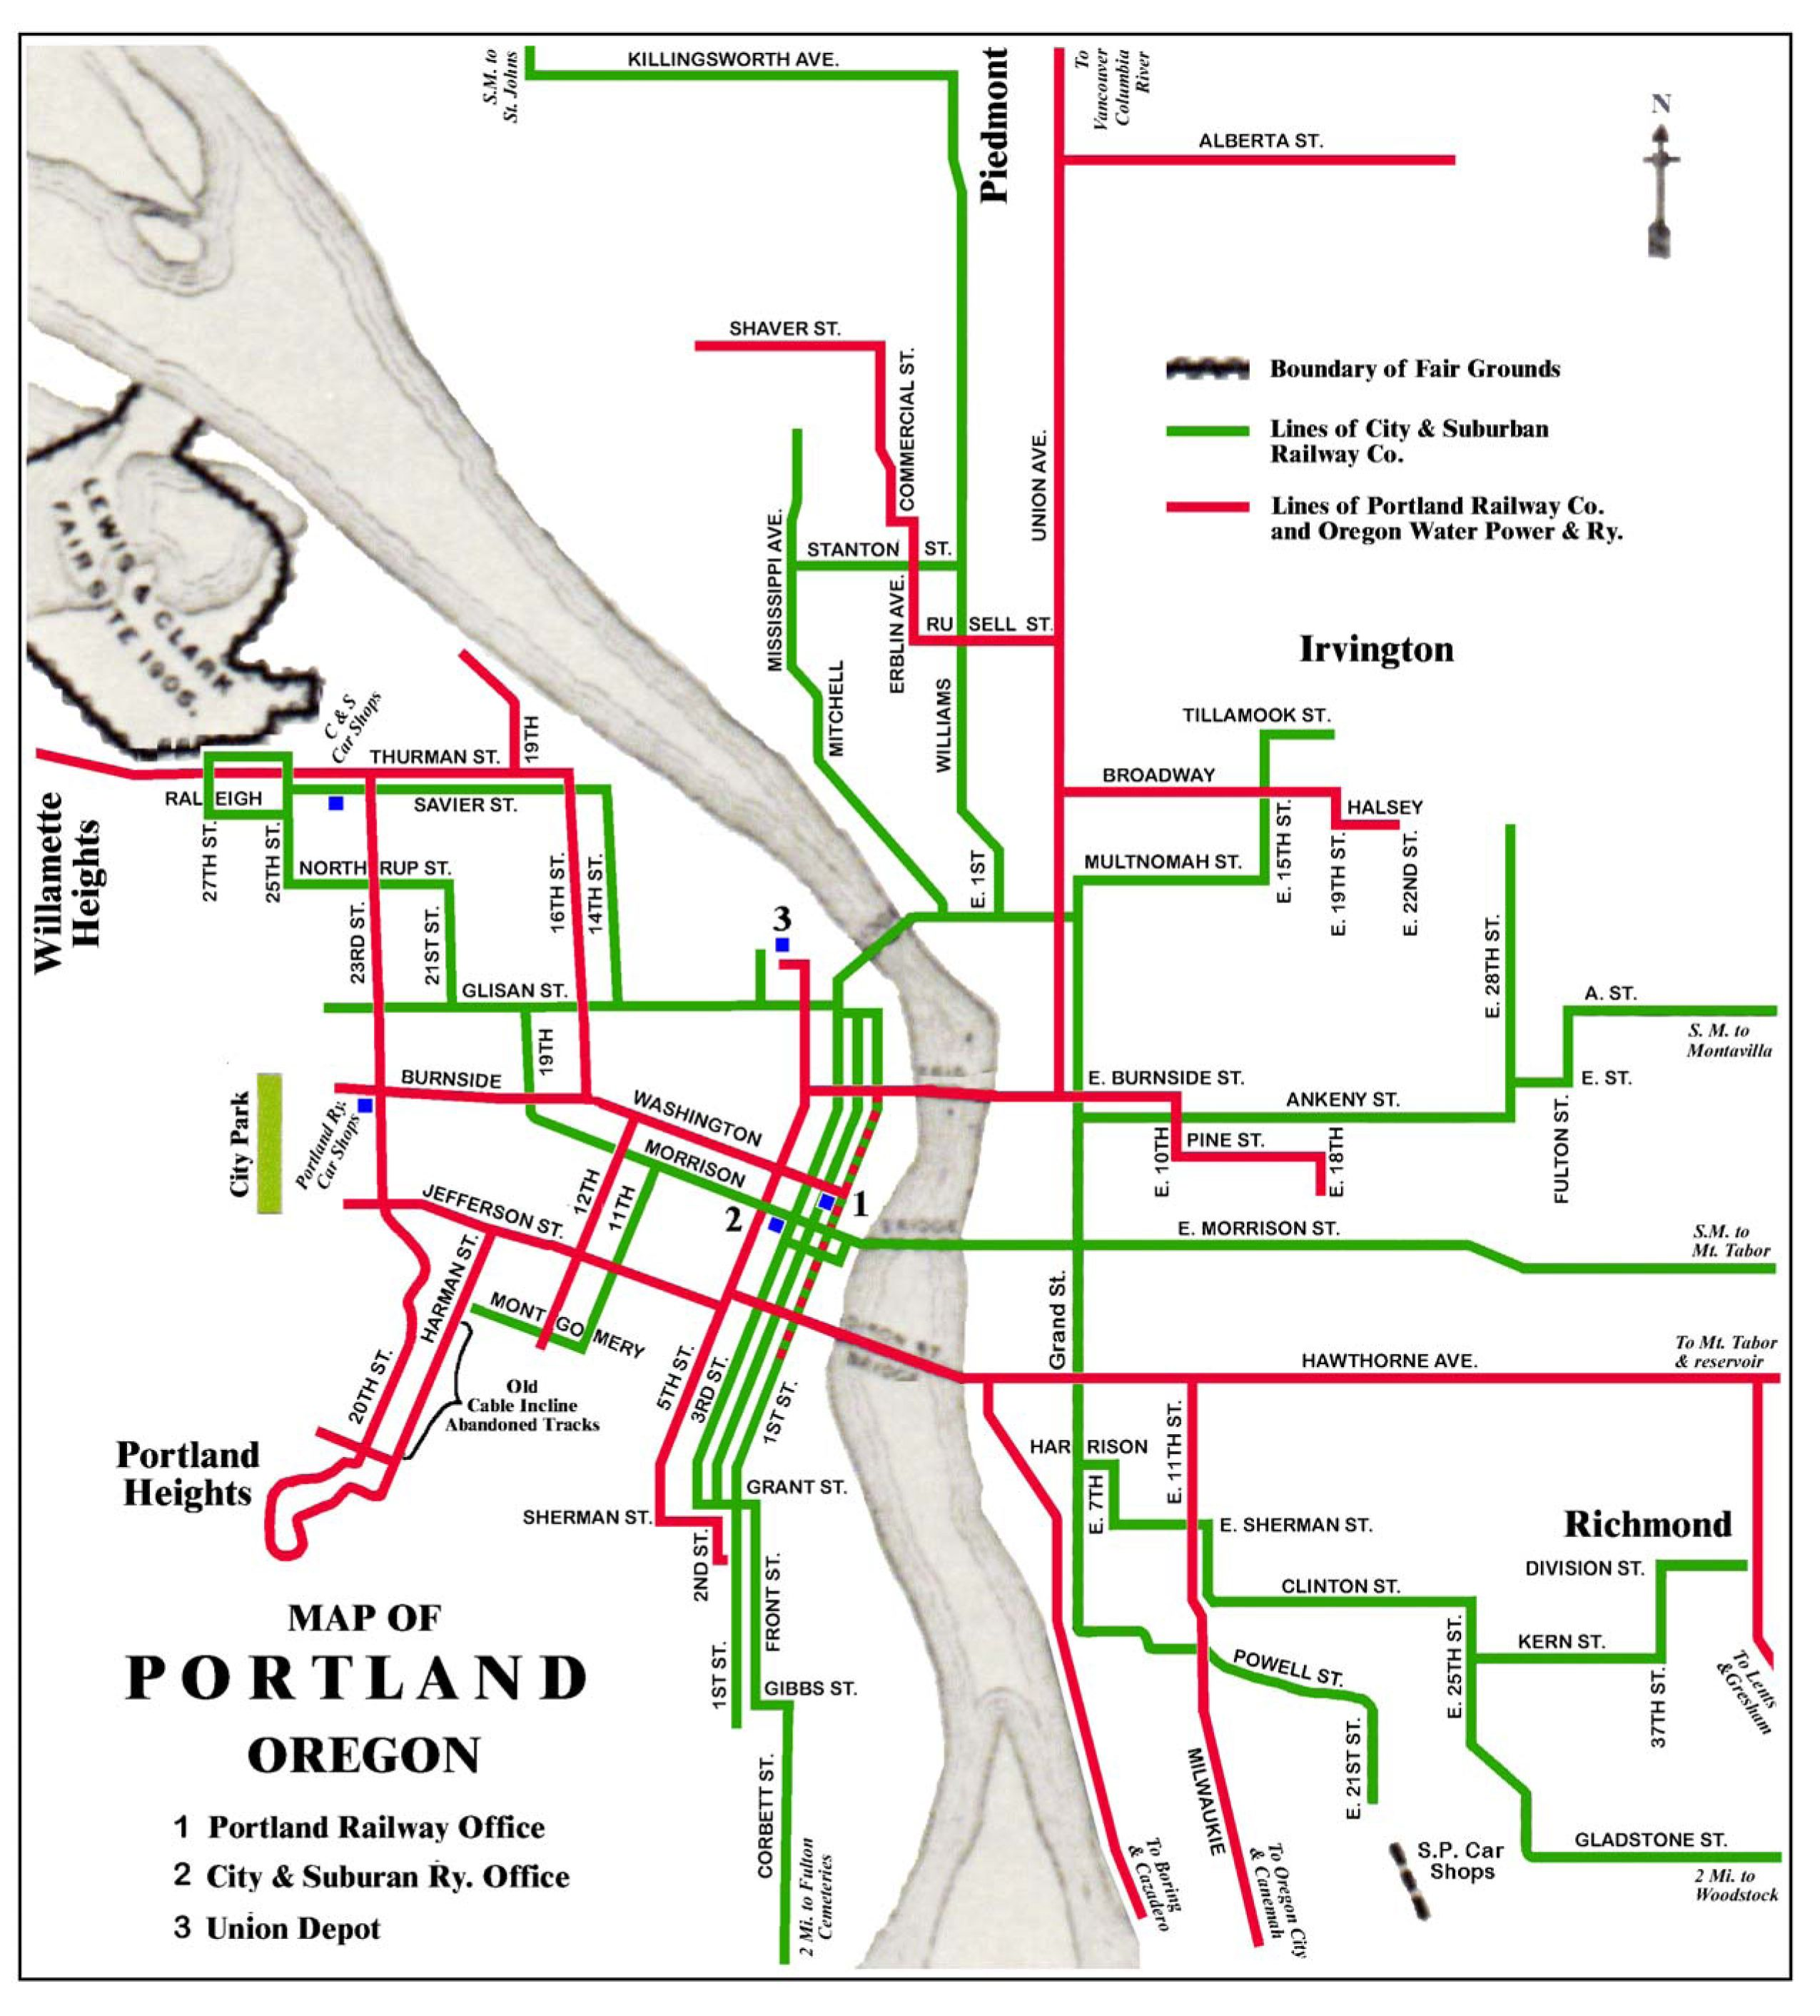 portland street car map Portland Streetcar System Portland Oregon City Irvington portland street car map